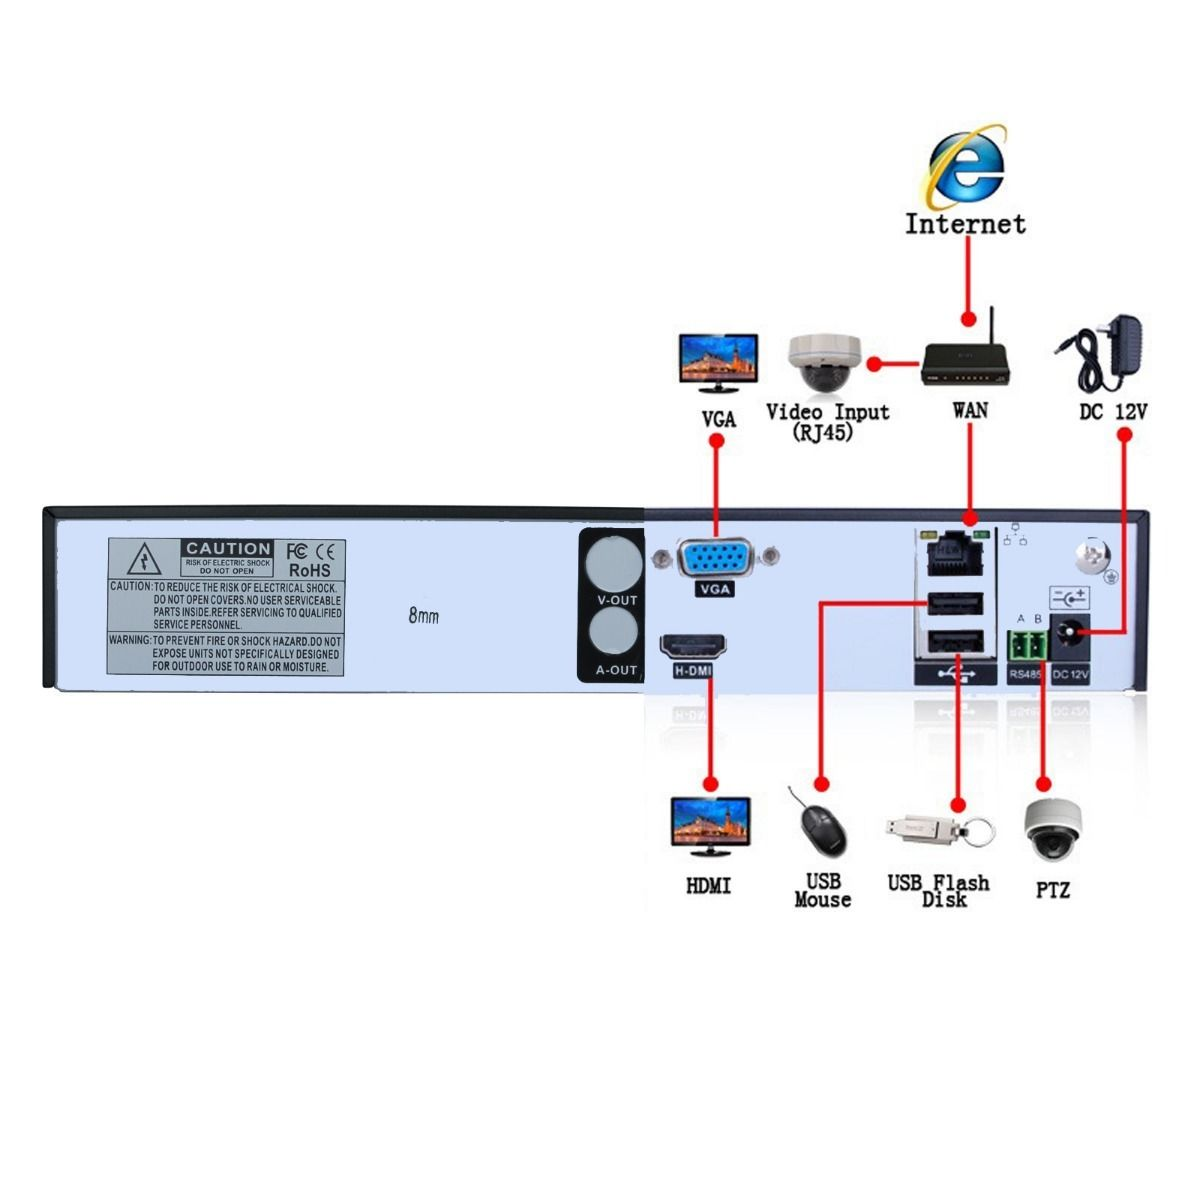 small resolution of cat cctv wiring diagram cat image wiring diagram wiring diagram cat5 cctv images rj11 cat5 wiring